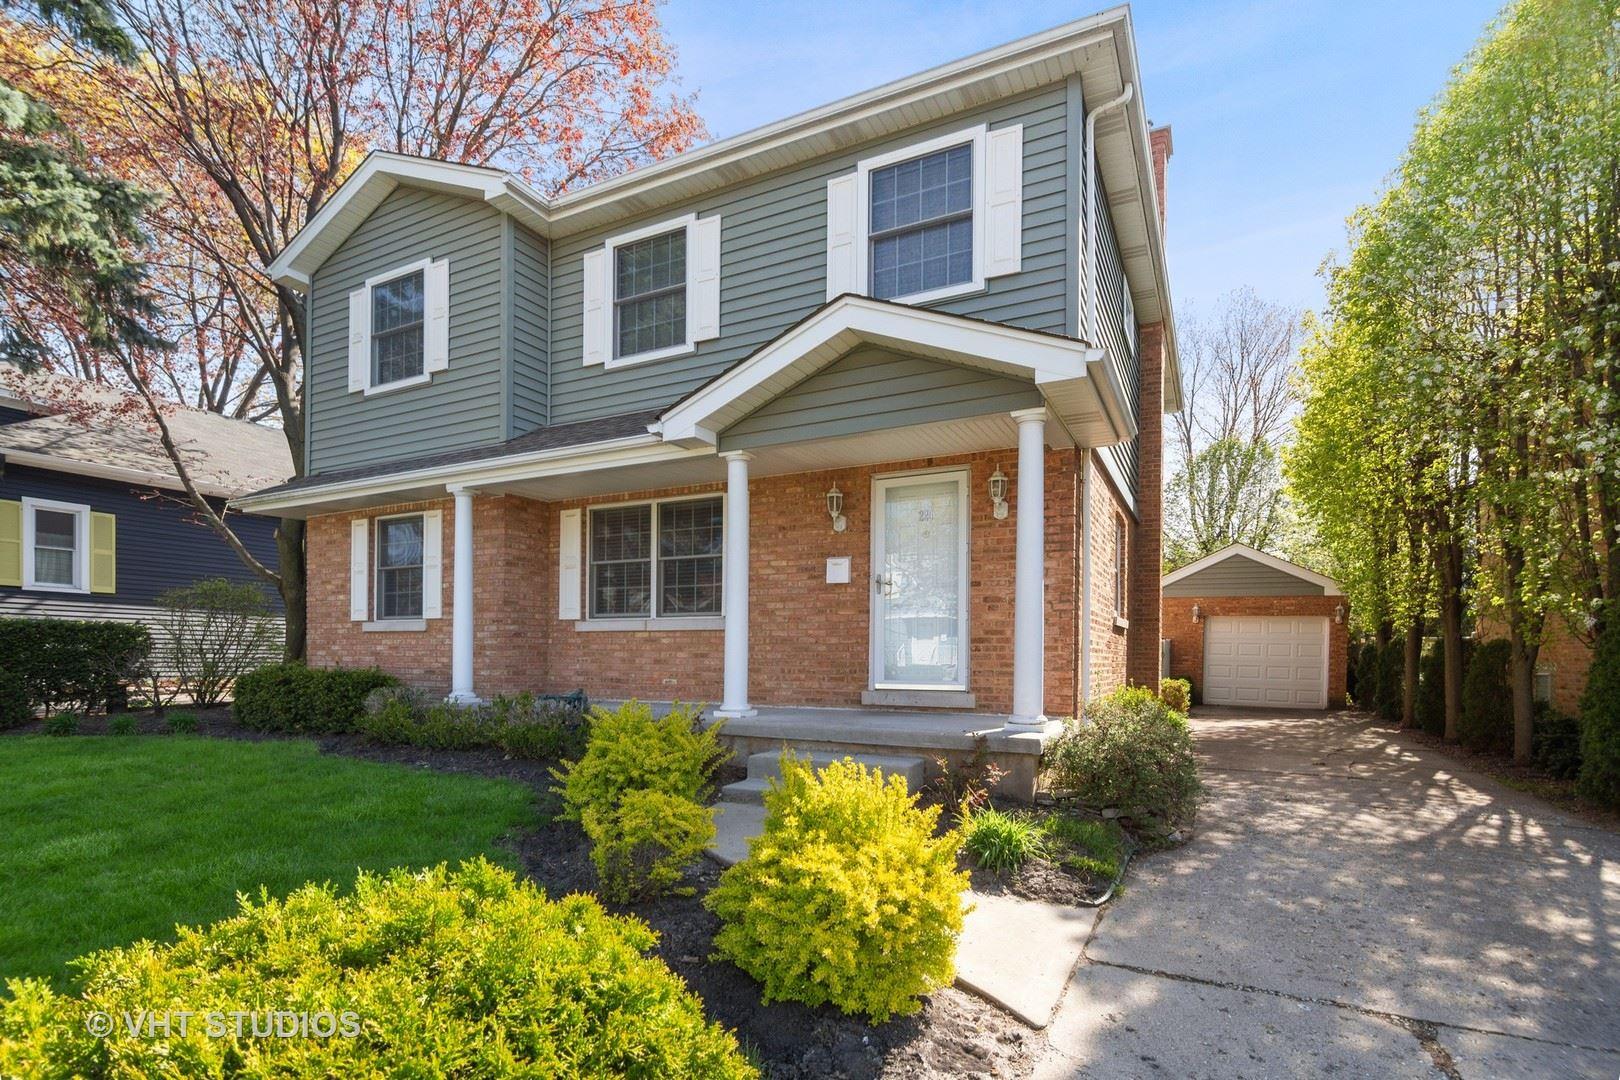 225 S Highland Avenue, Arlington Heights, IL 60005 - #: 10651965